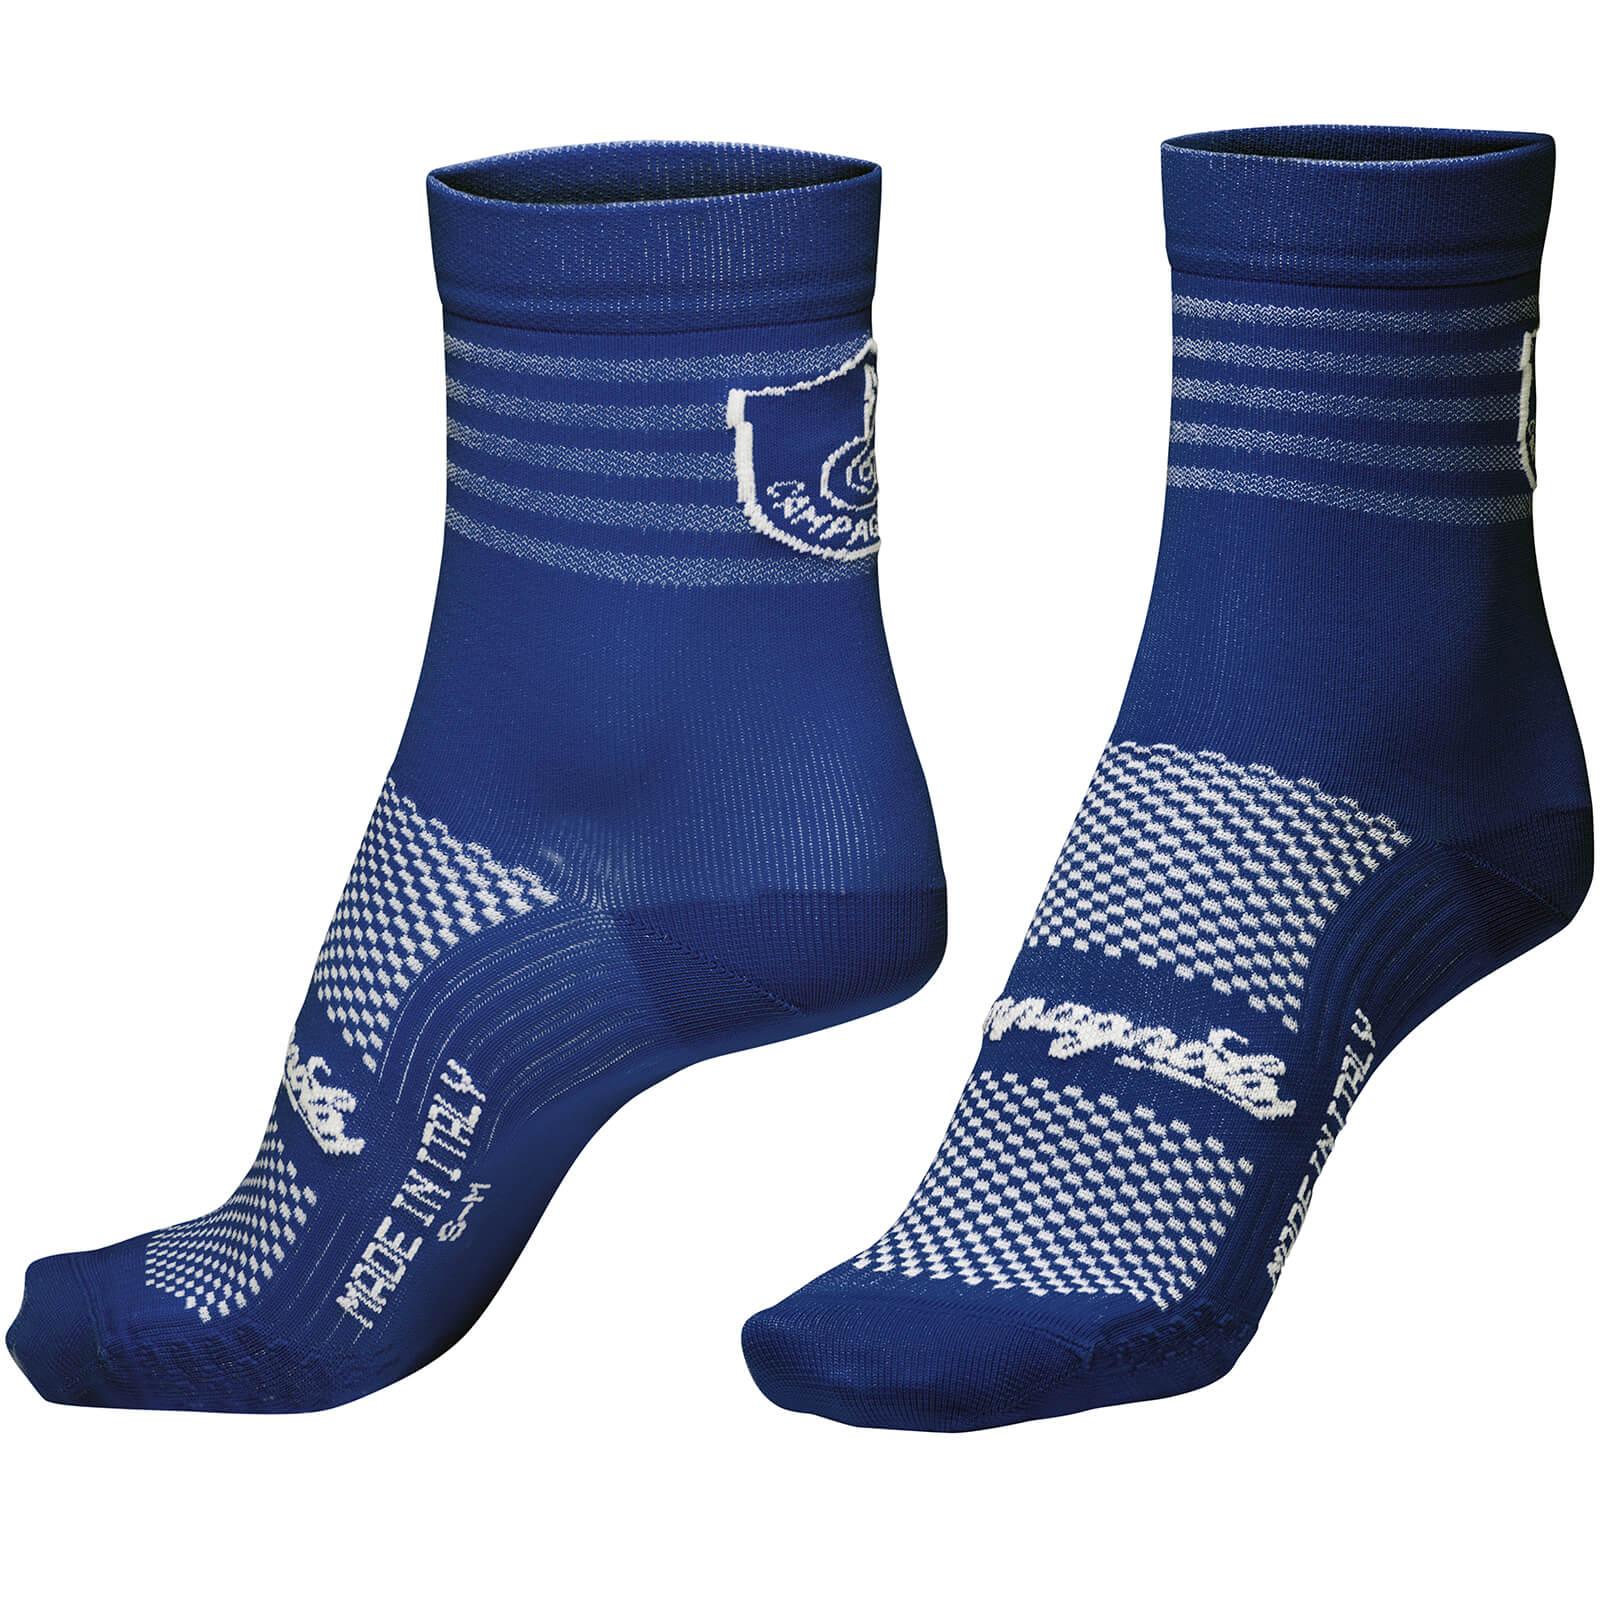 Nalini Campagnolo Litech Socks - S/M - Blue